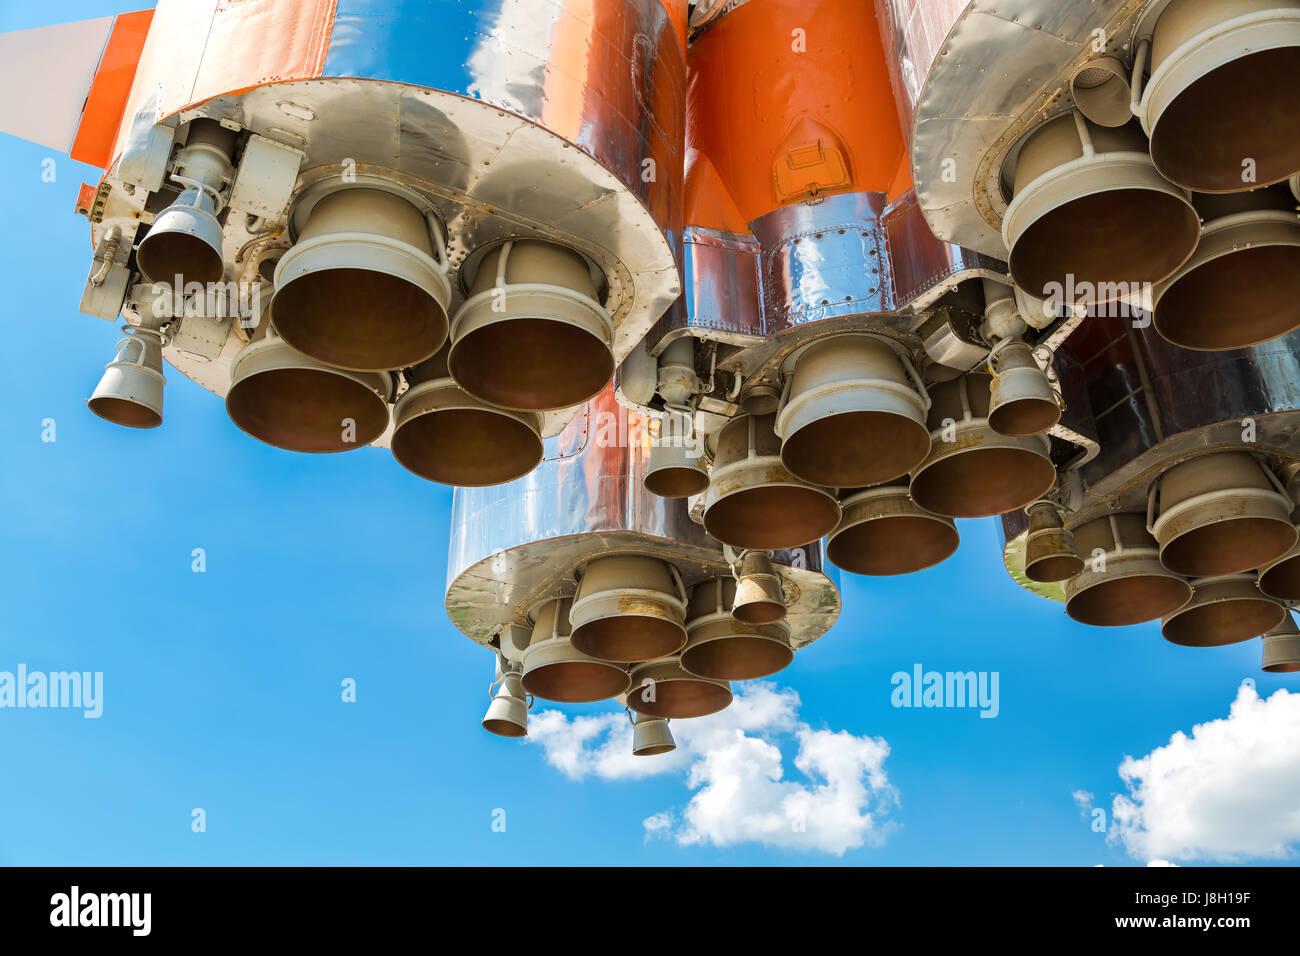 Motores de cohete espacial de la nave espacial rusa sobre fondo de cielo azul Foto de stock